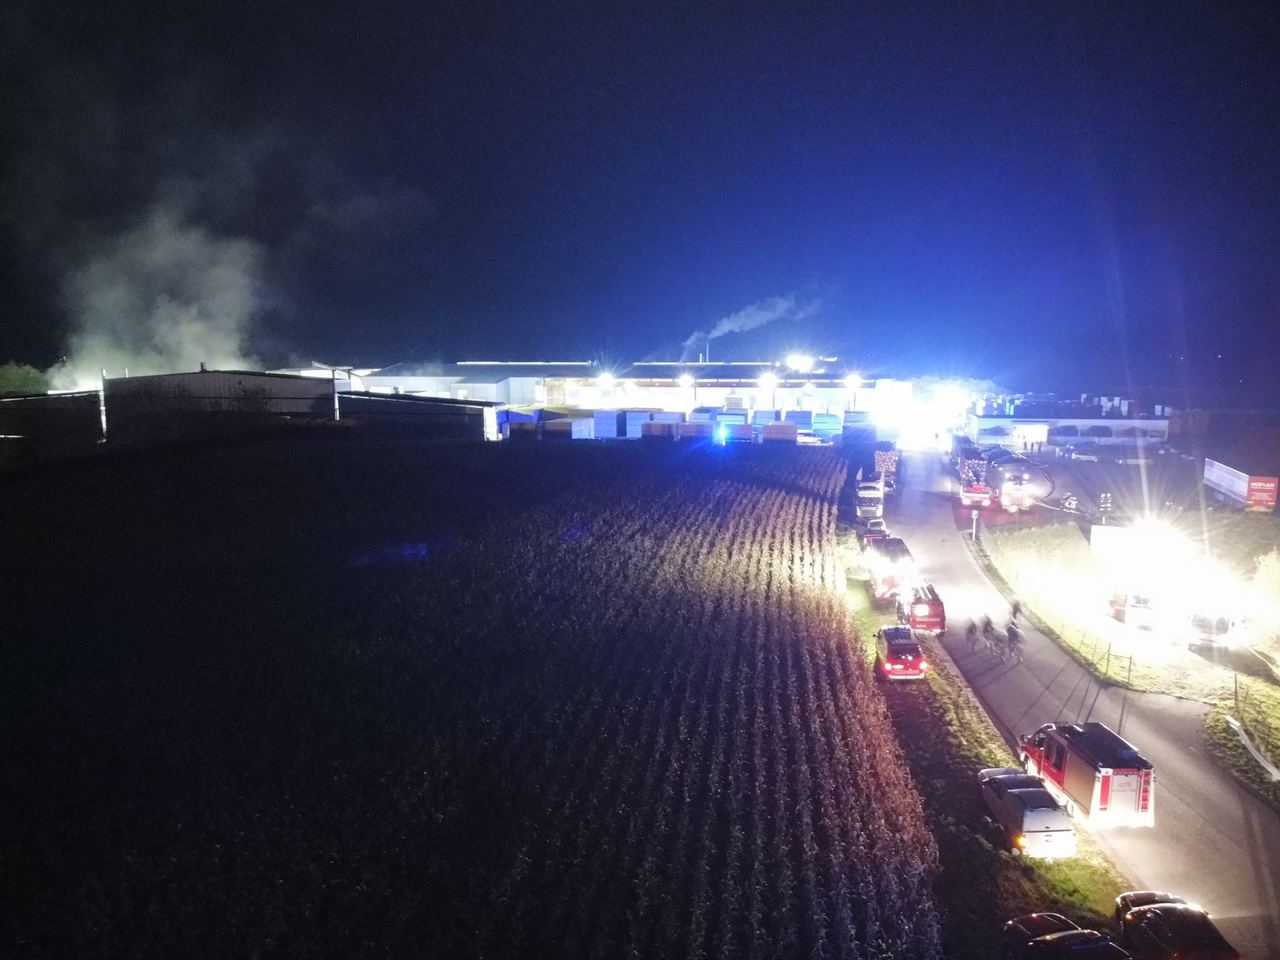 B4 Großbrand in einem Holzindustriebetrieb